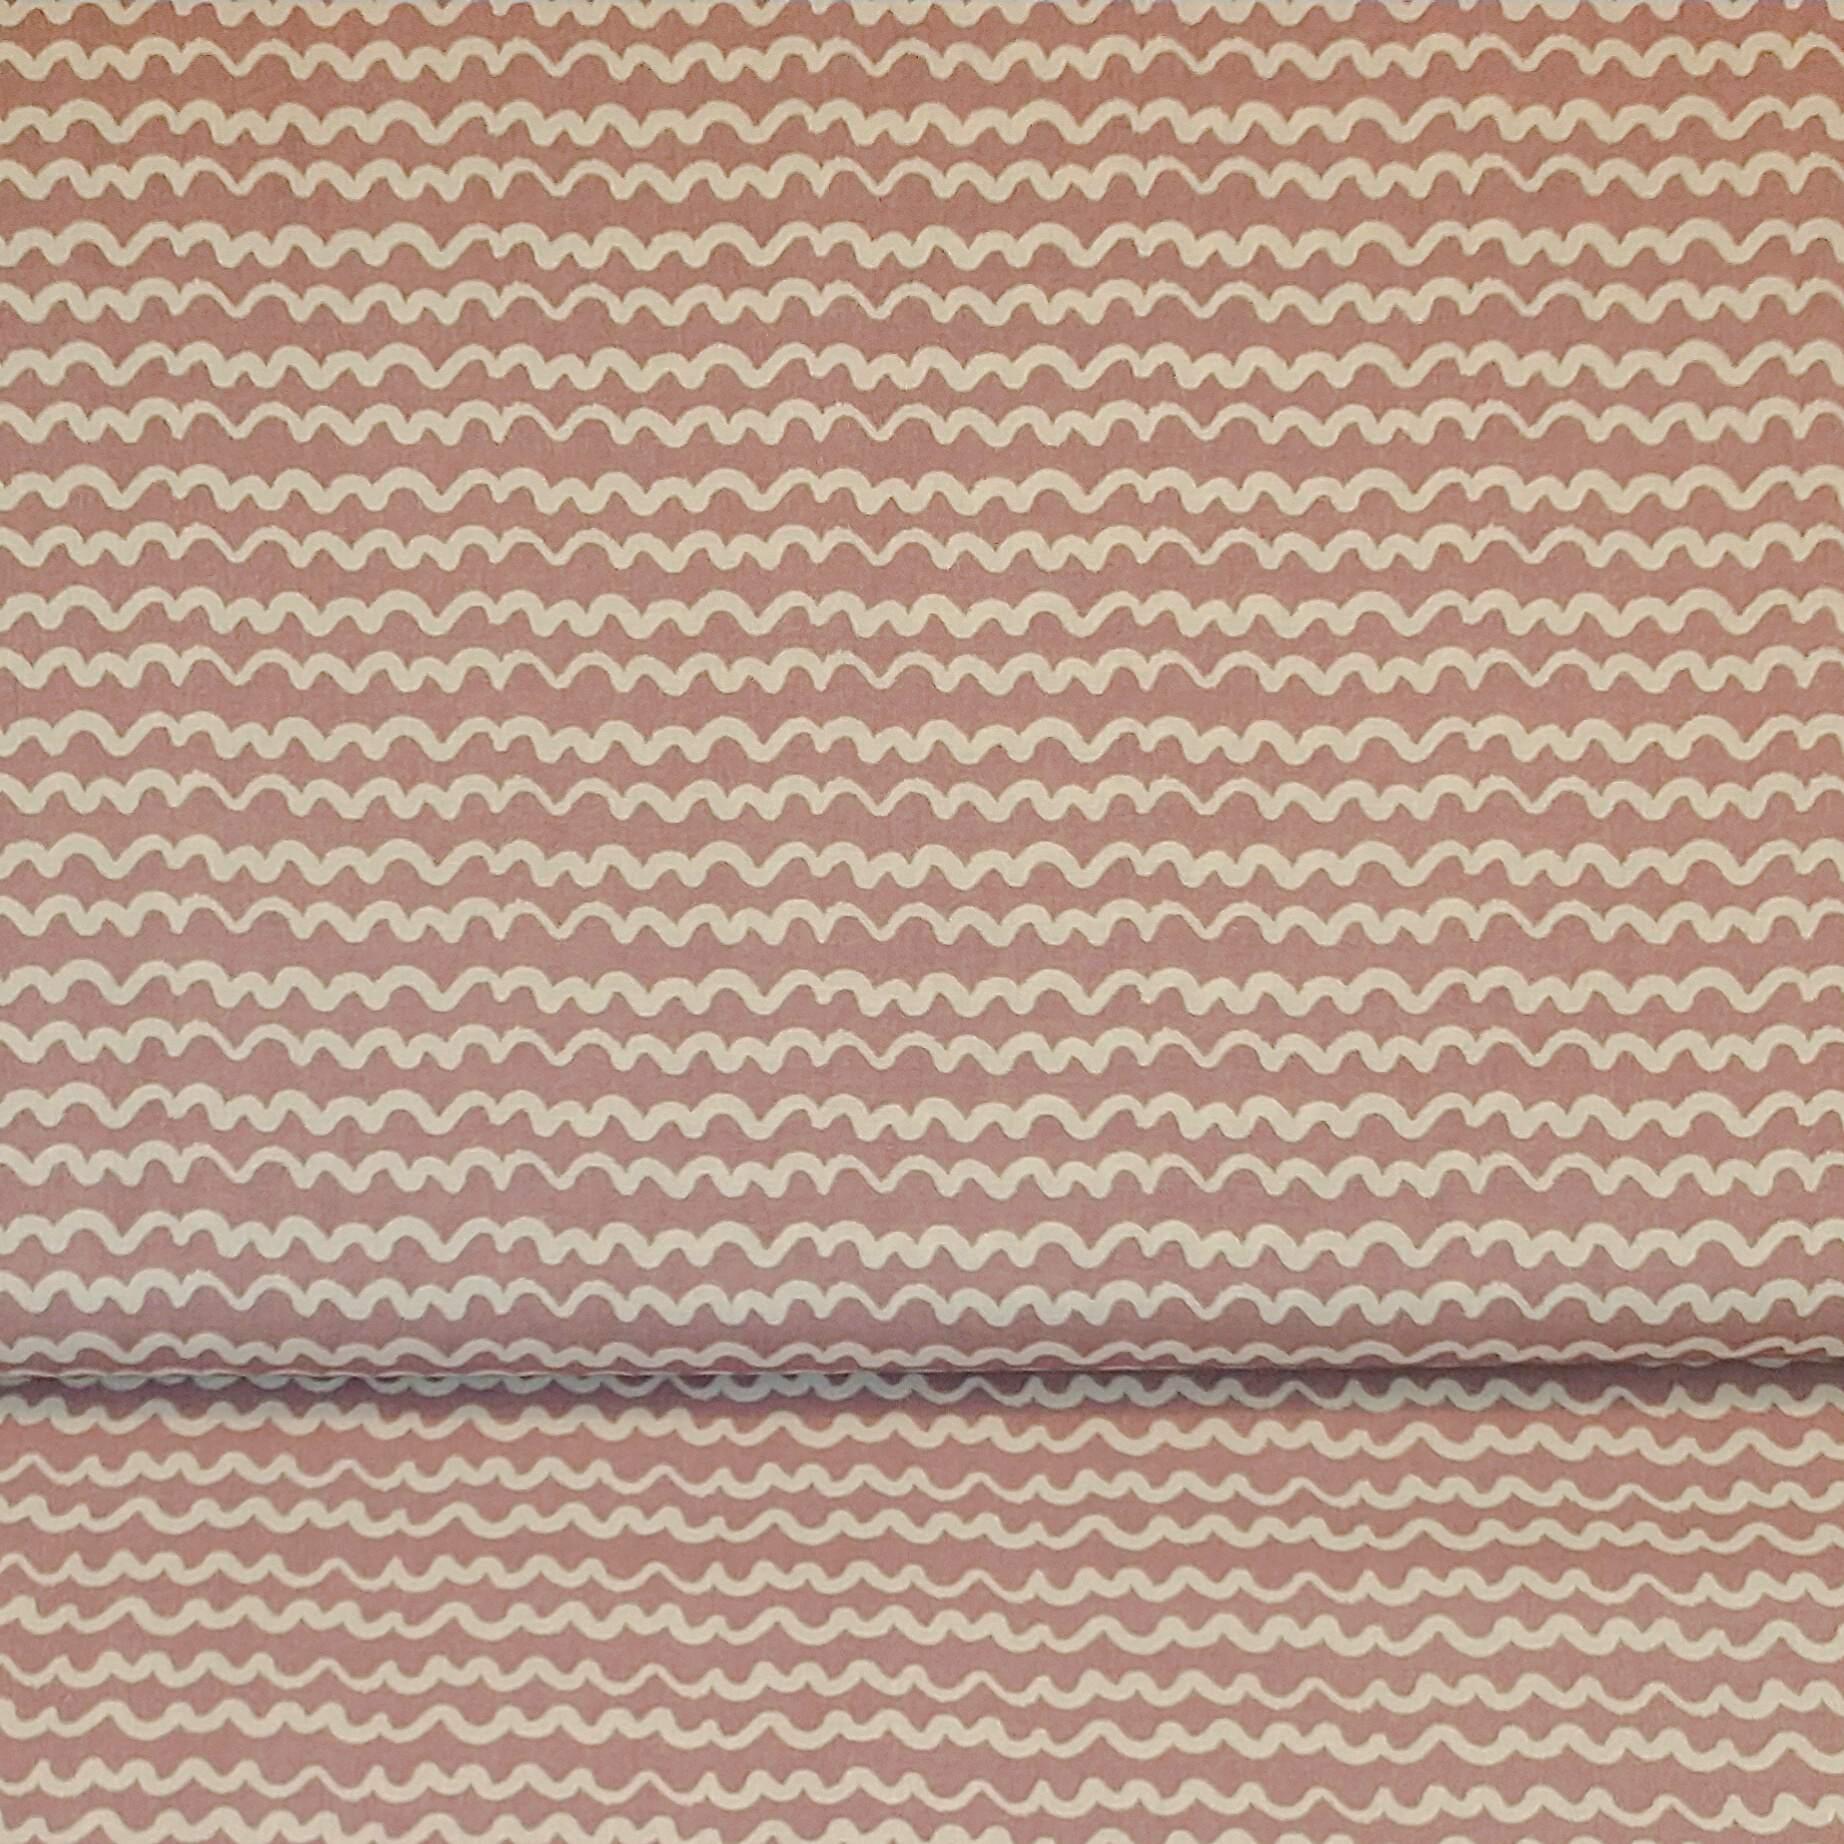 tela algodón colección